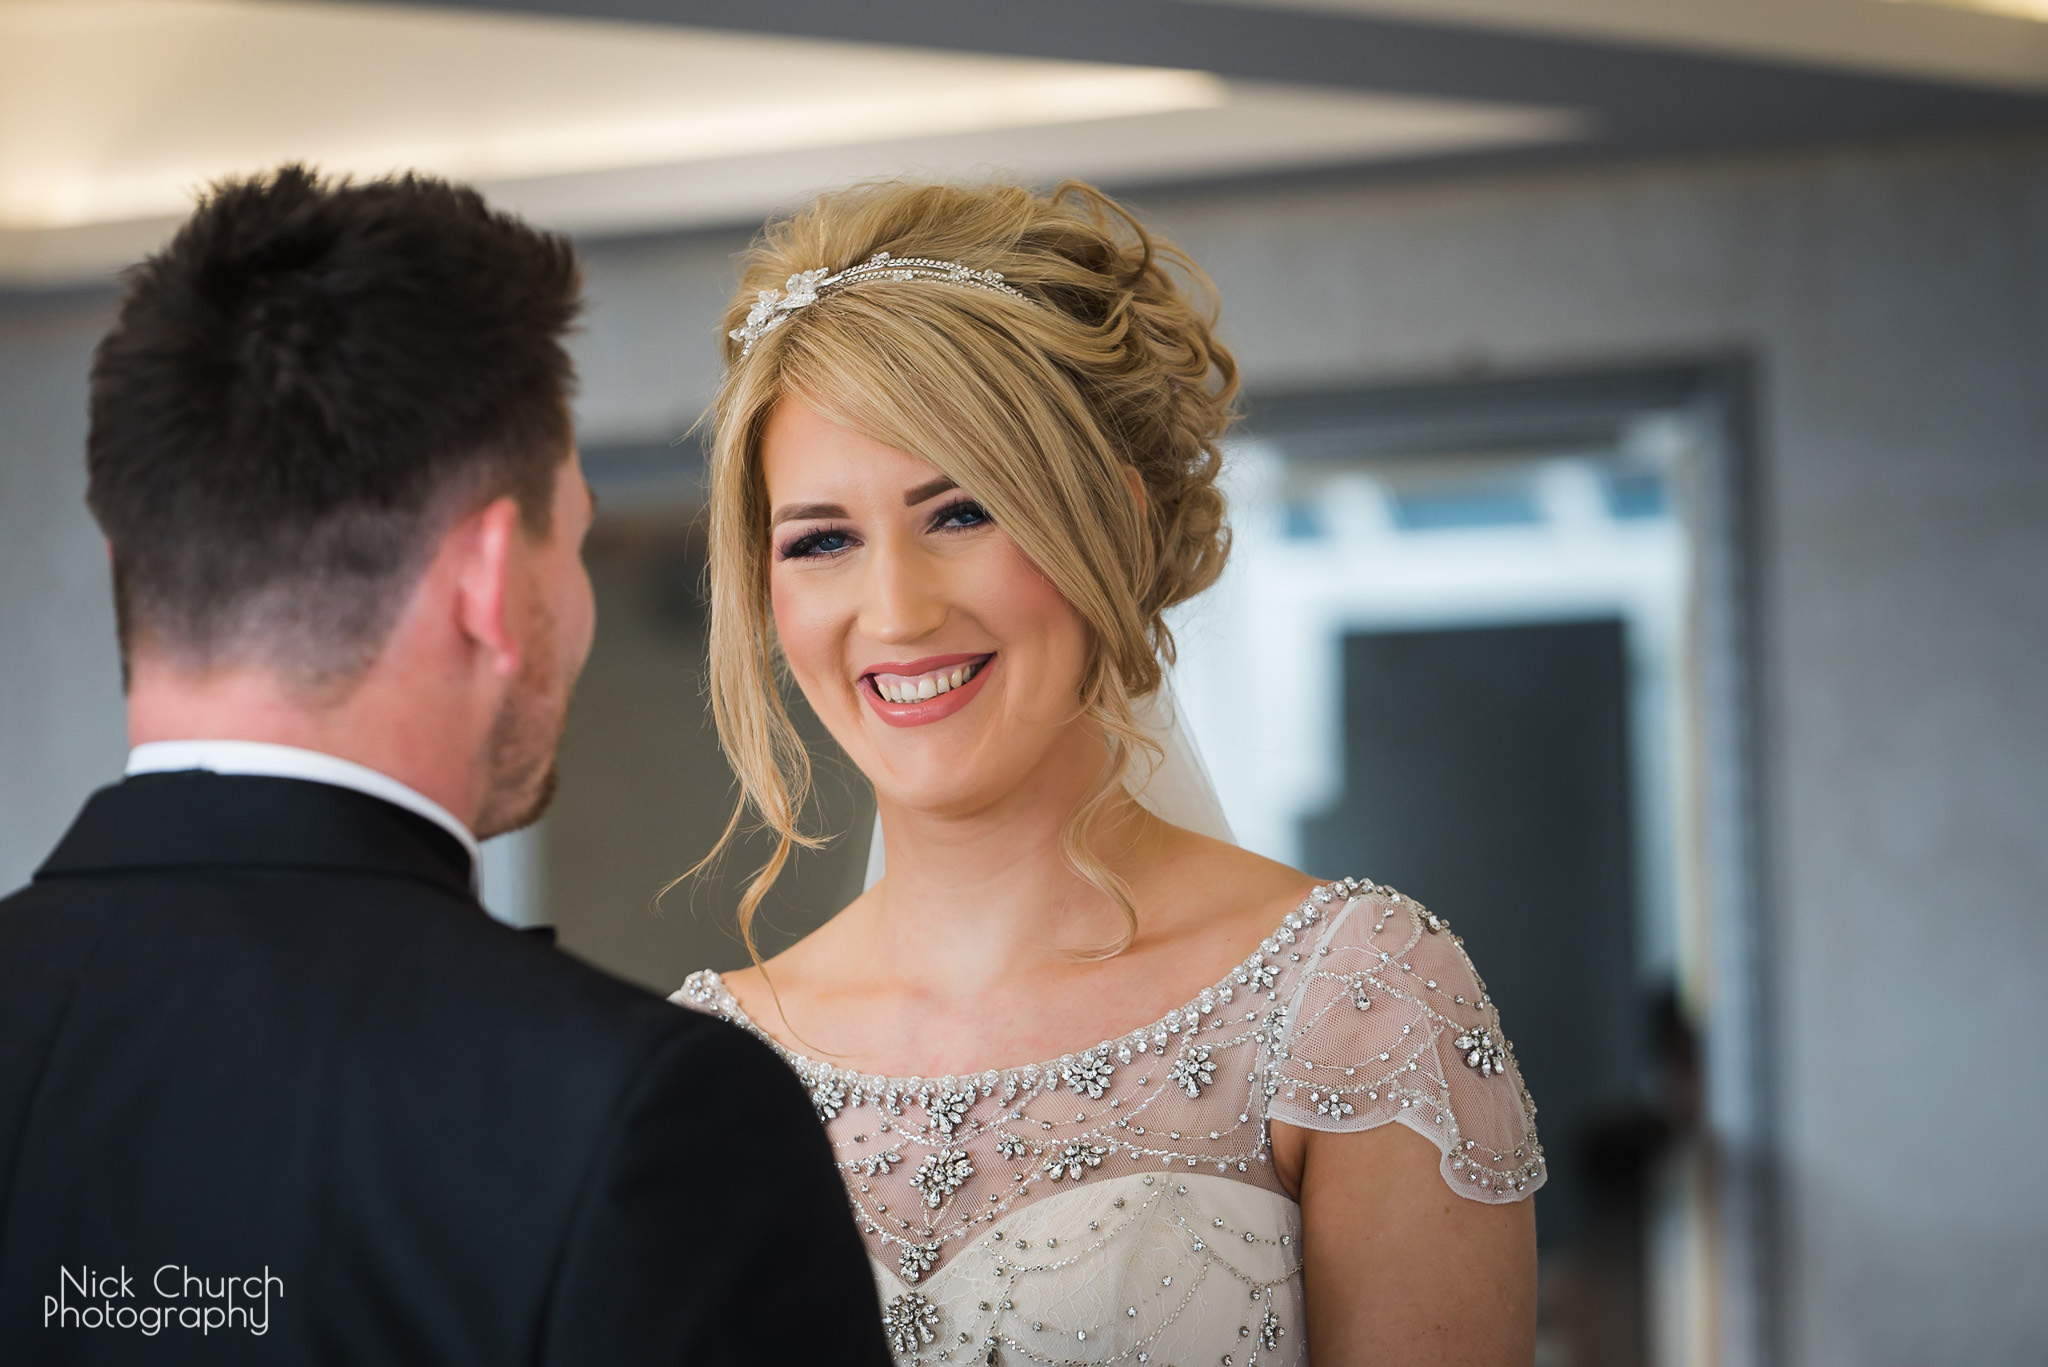 NC-20180317-stacy-and-mike-wedding-0477.jpg